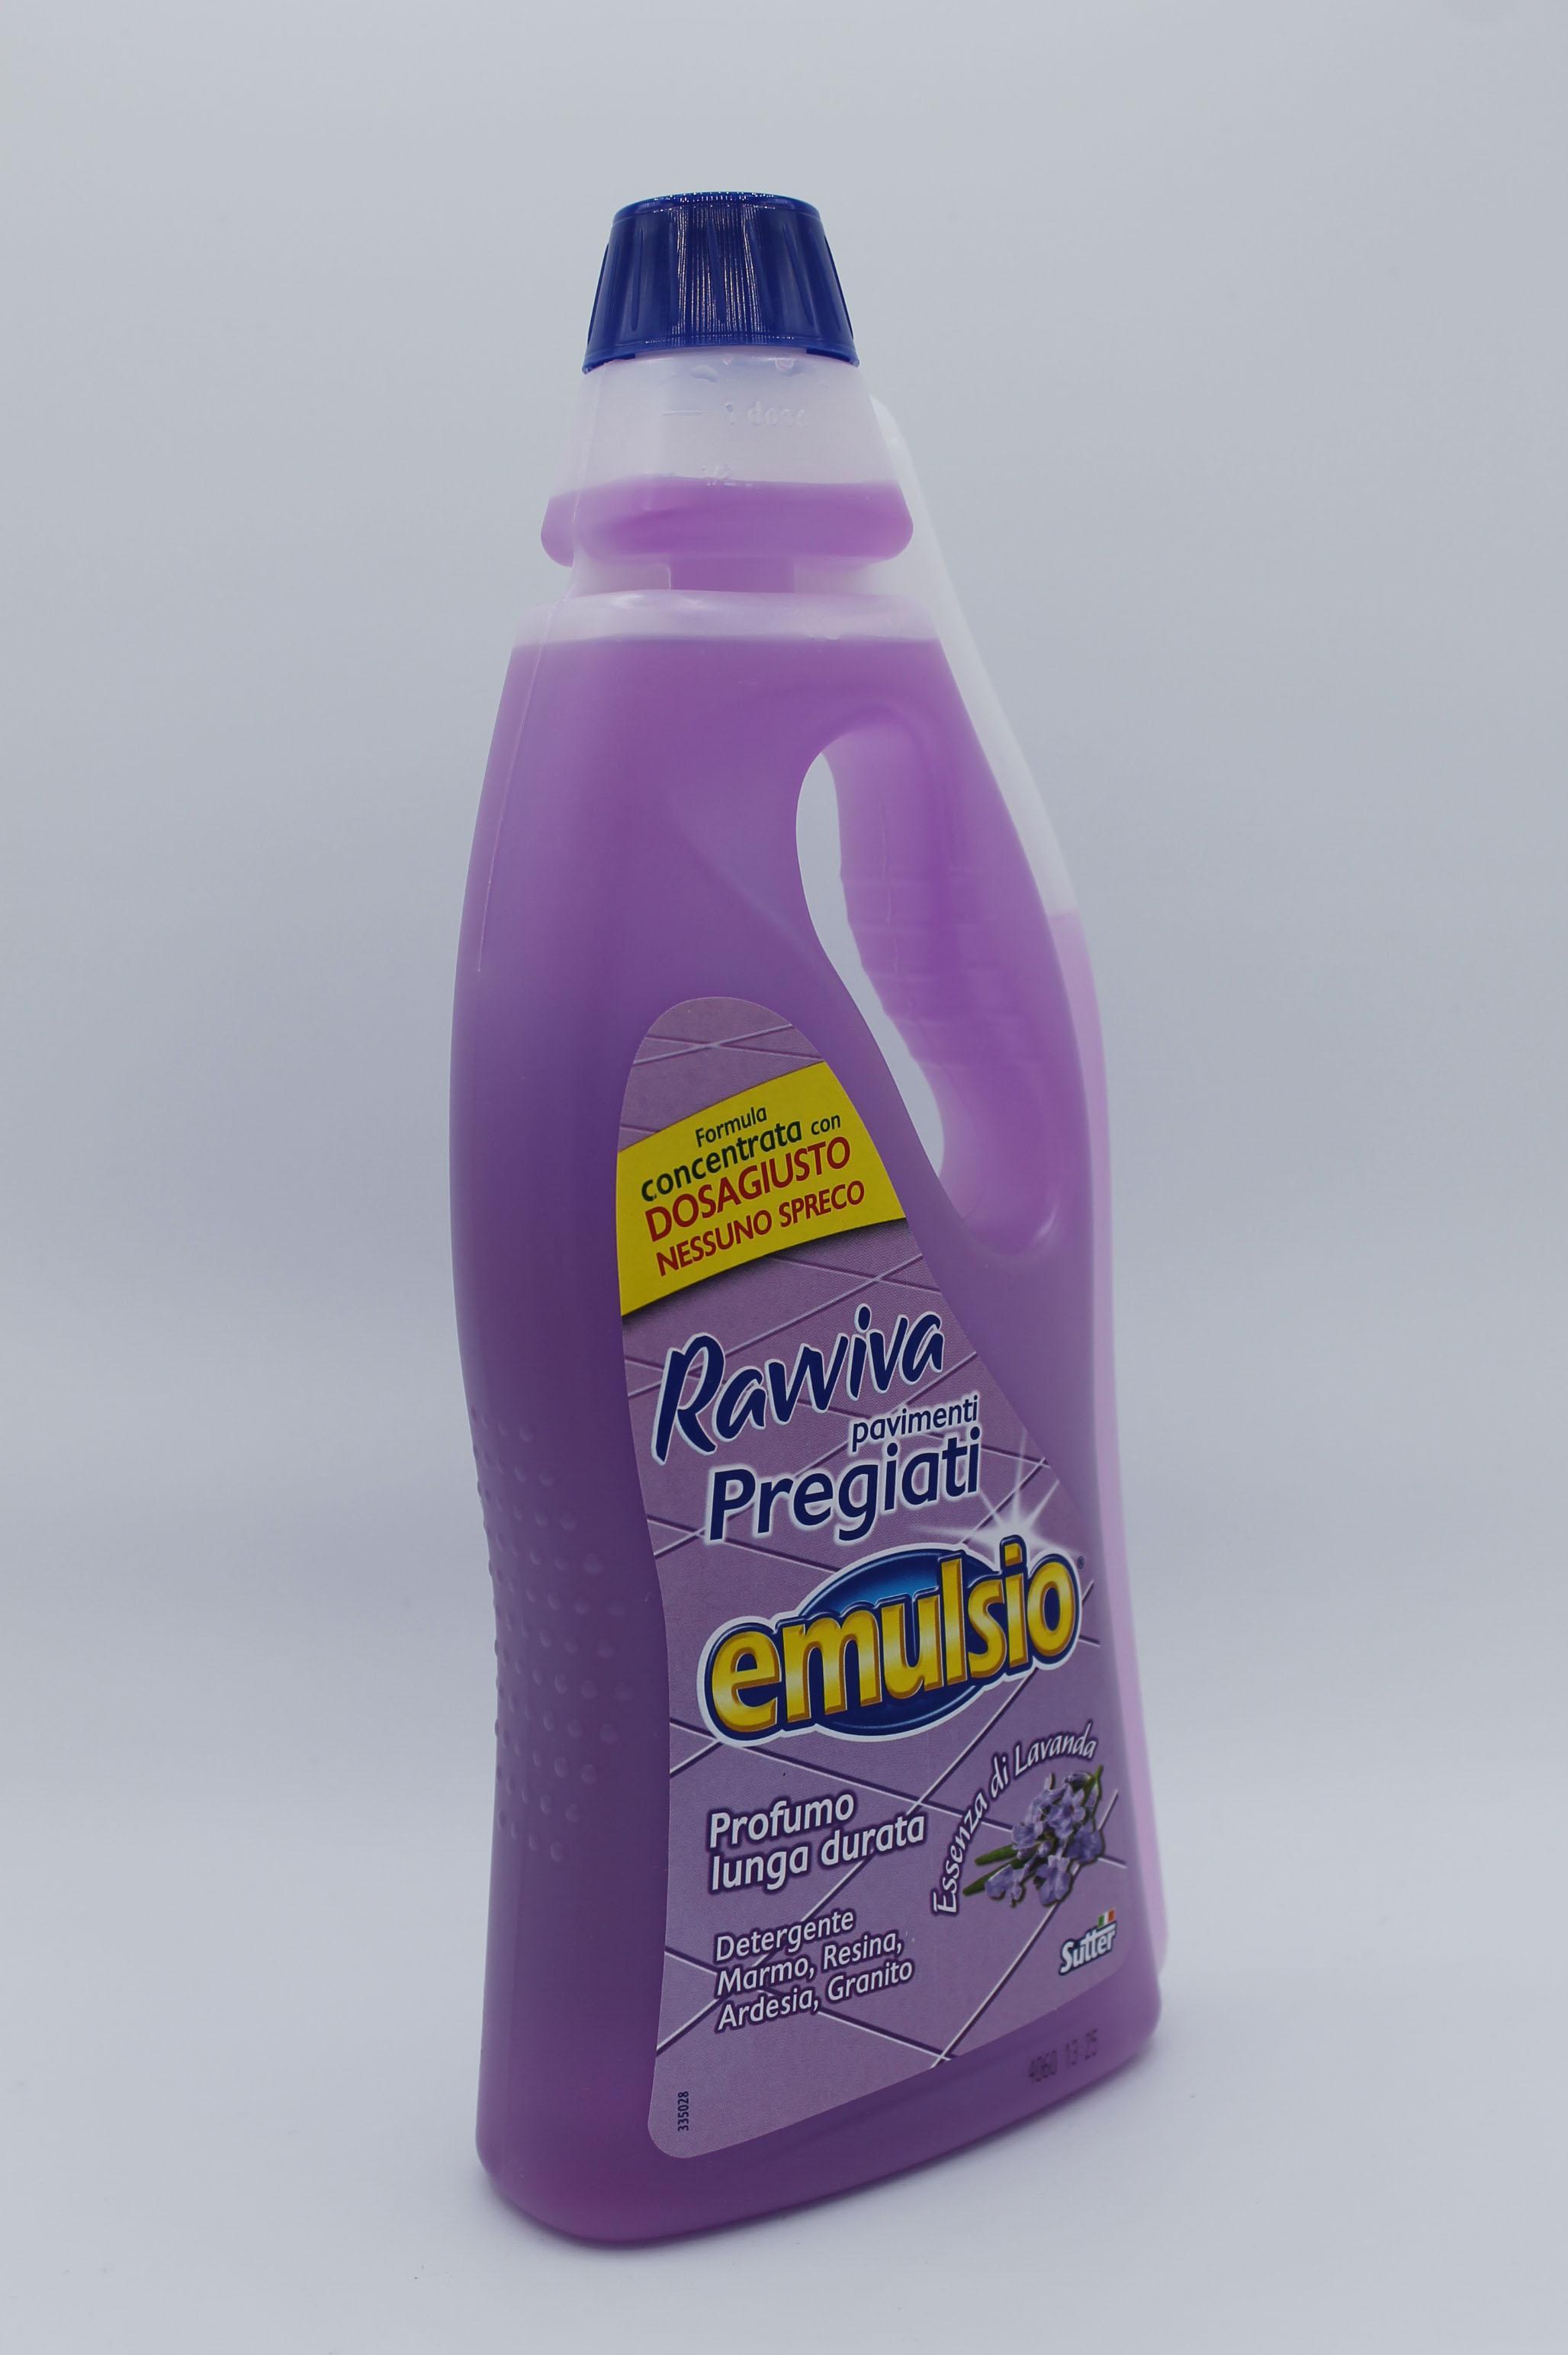 Emulsio ravviva pavimenti 750ml varie profumazioni.